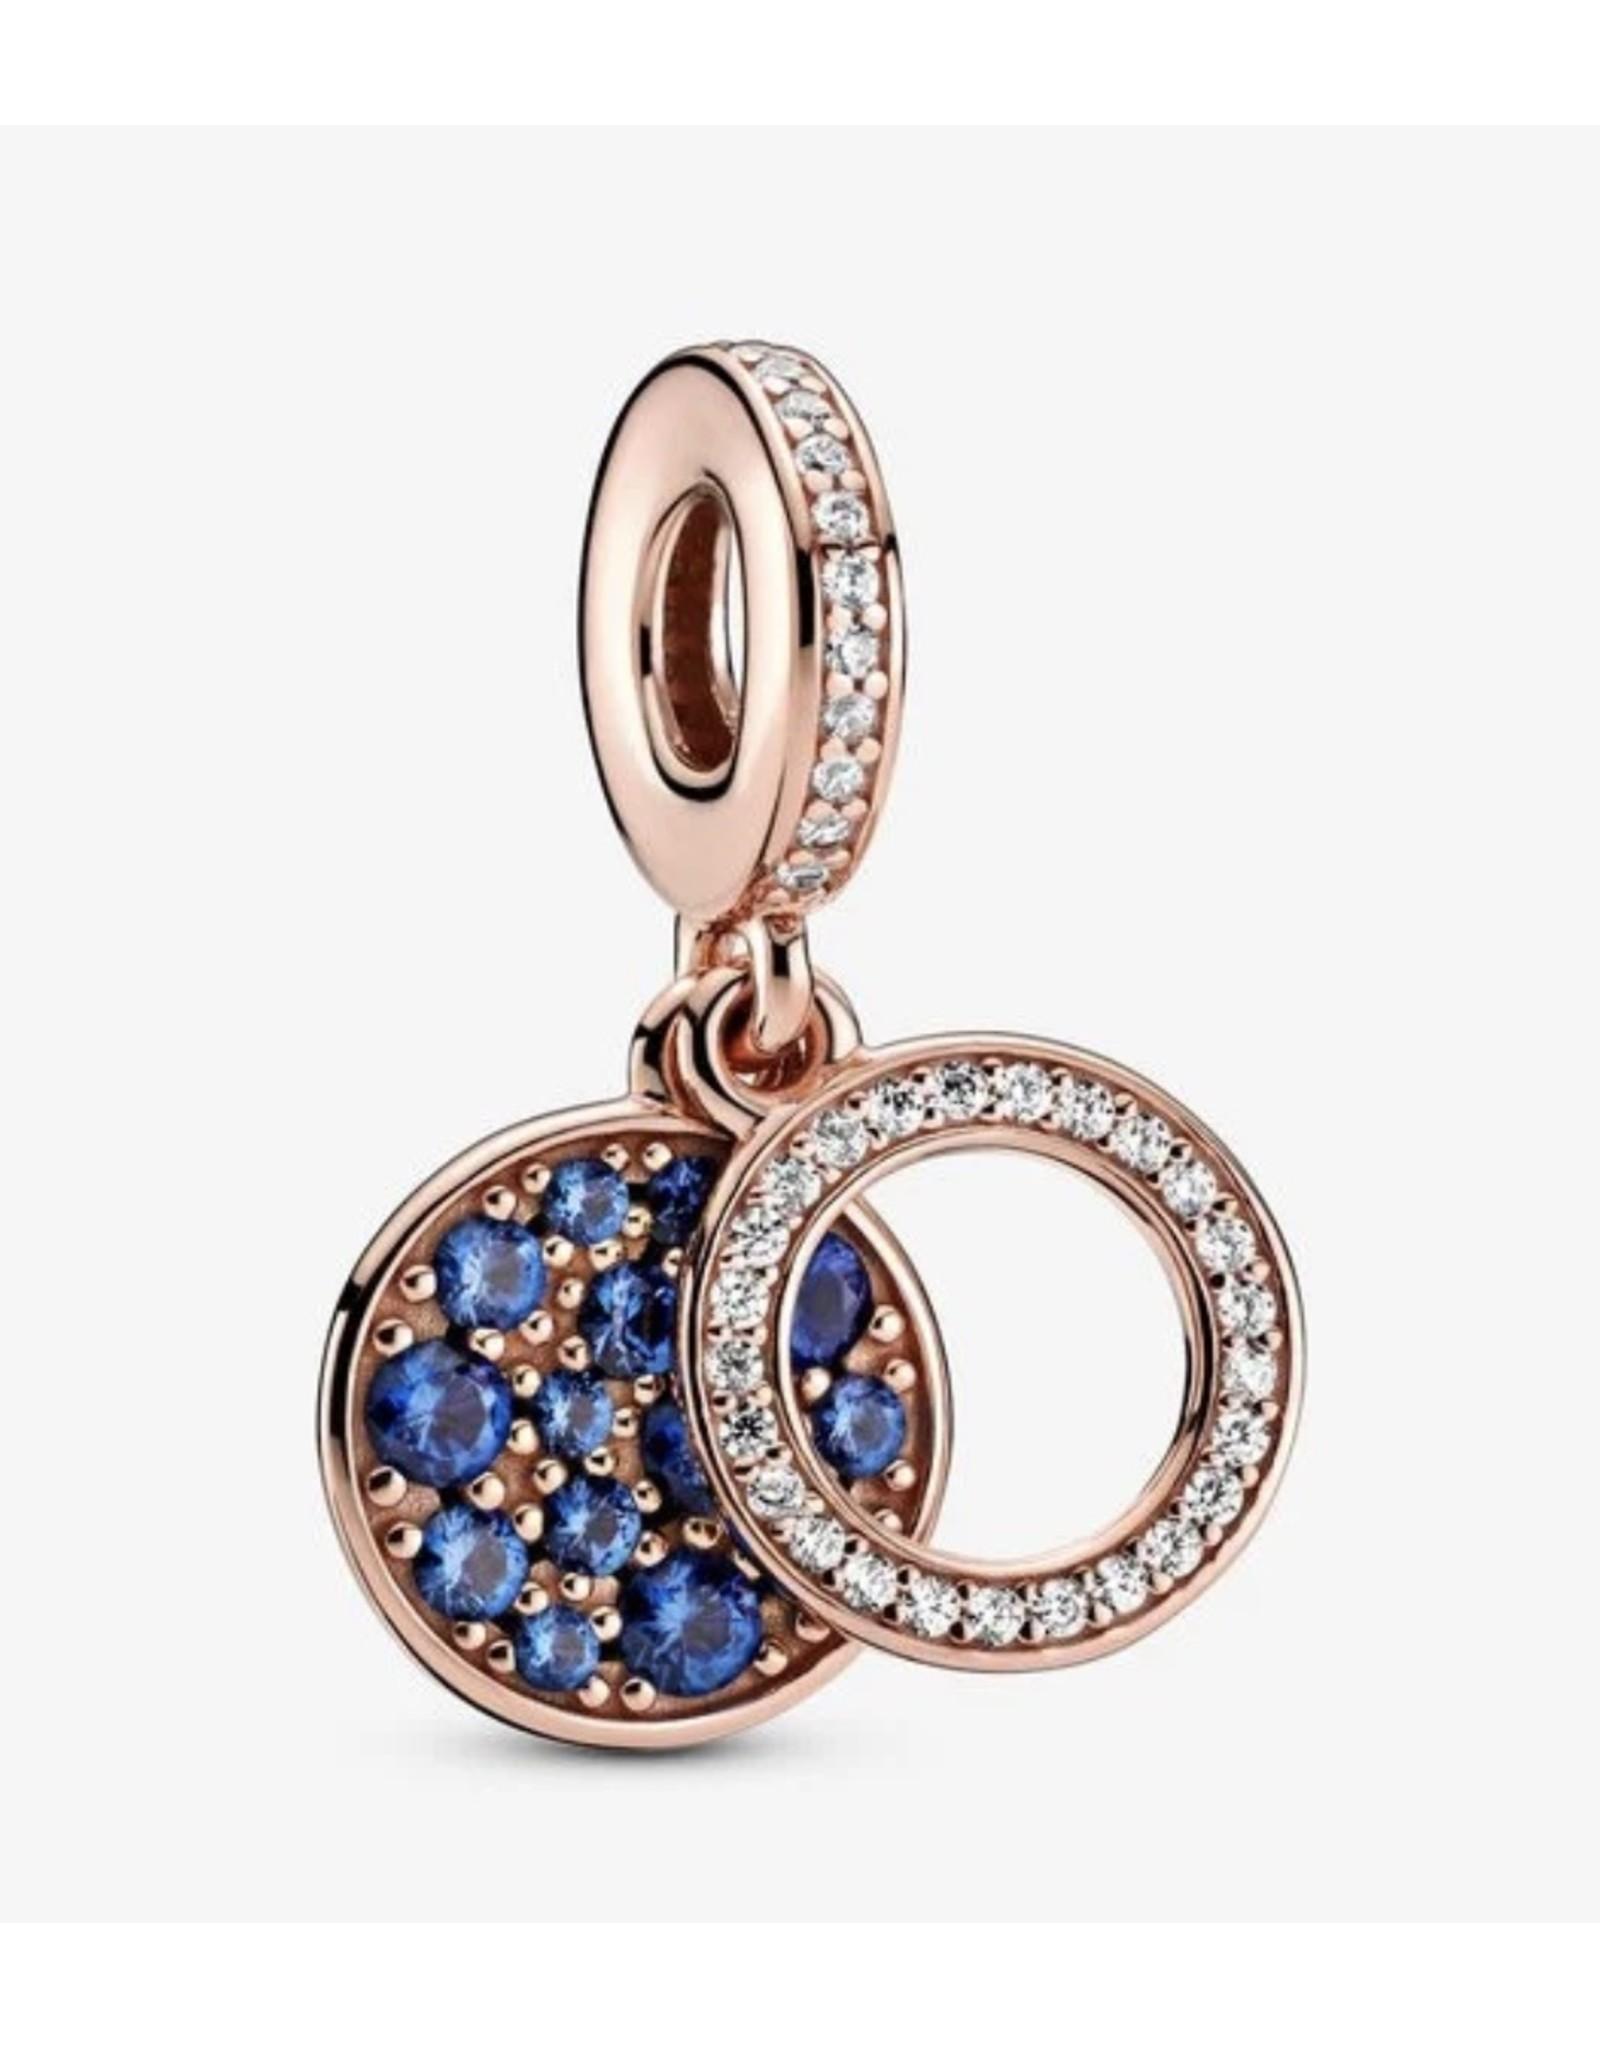 Pandora Pandora Charm, 789186C01, Sparkling Blue Disc, Blue Crystal & Clear CZ